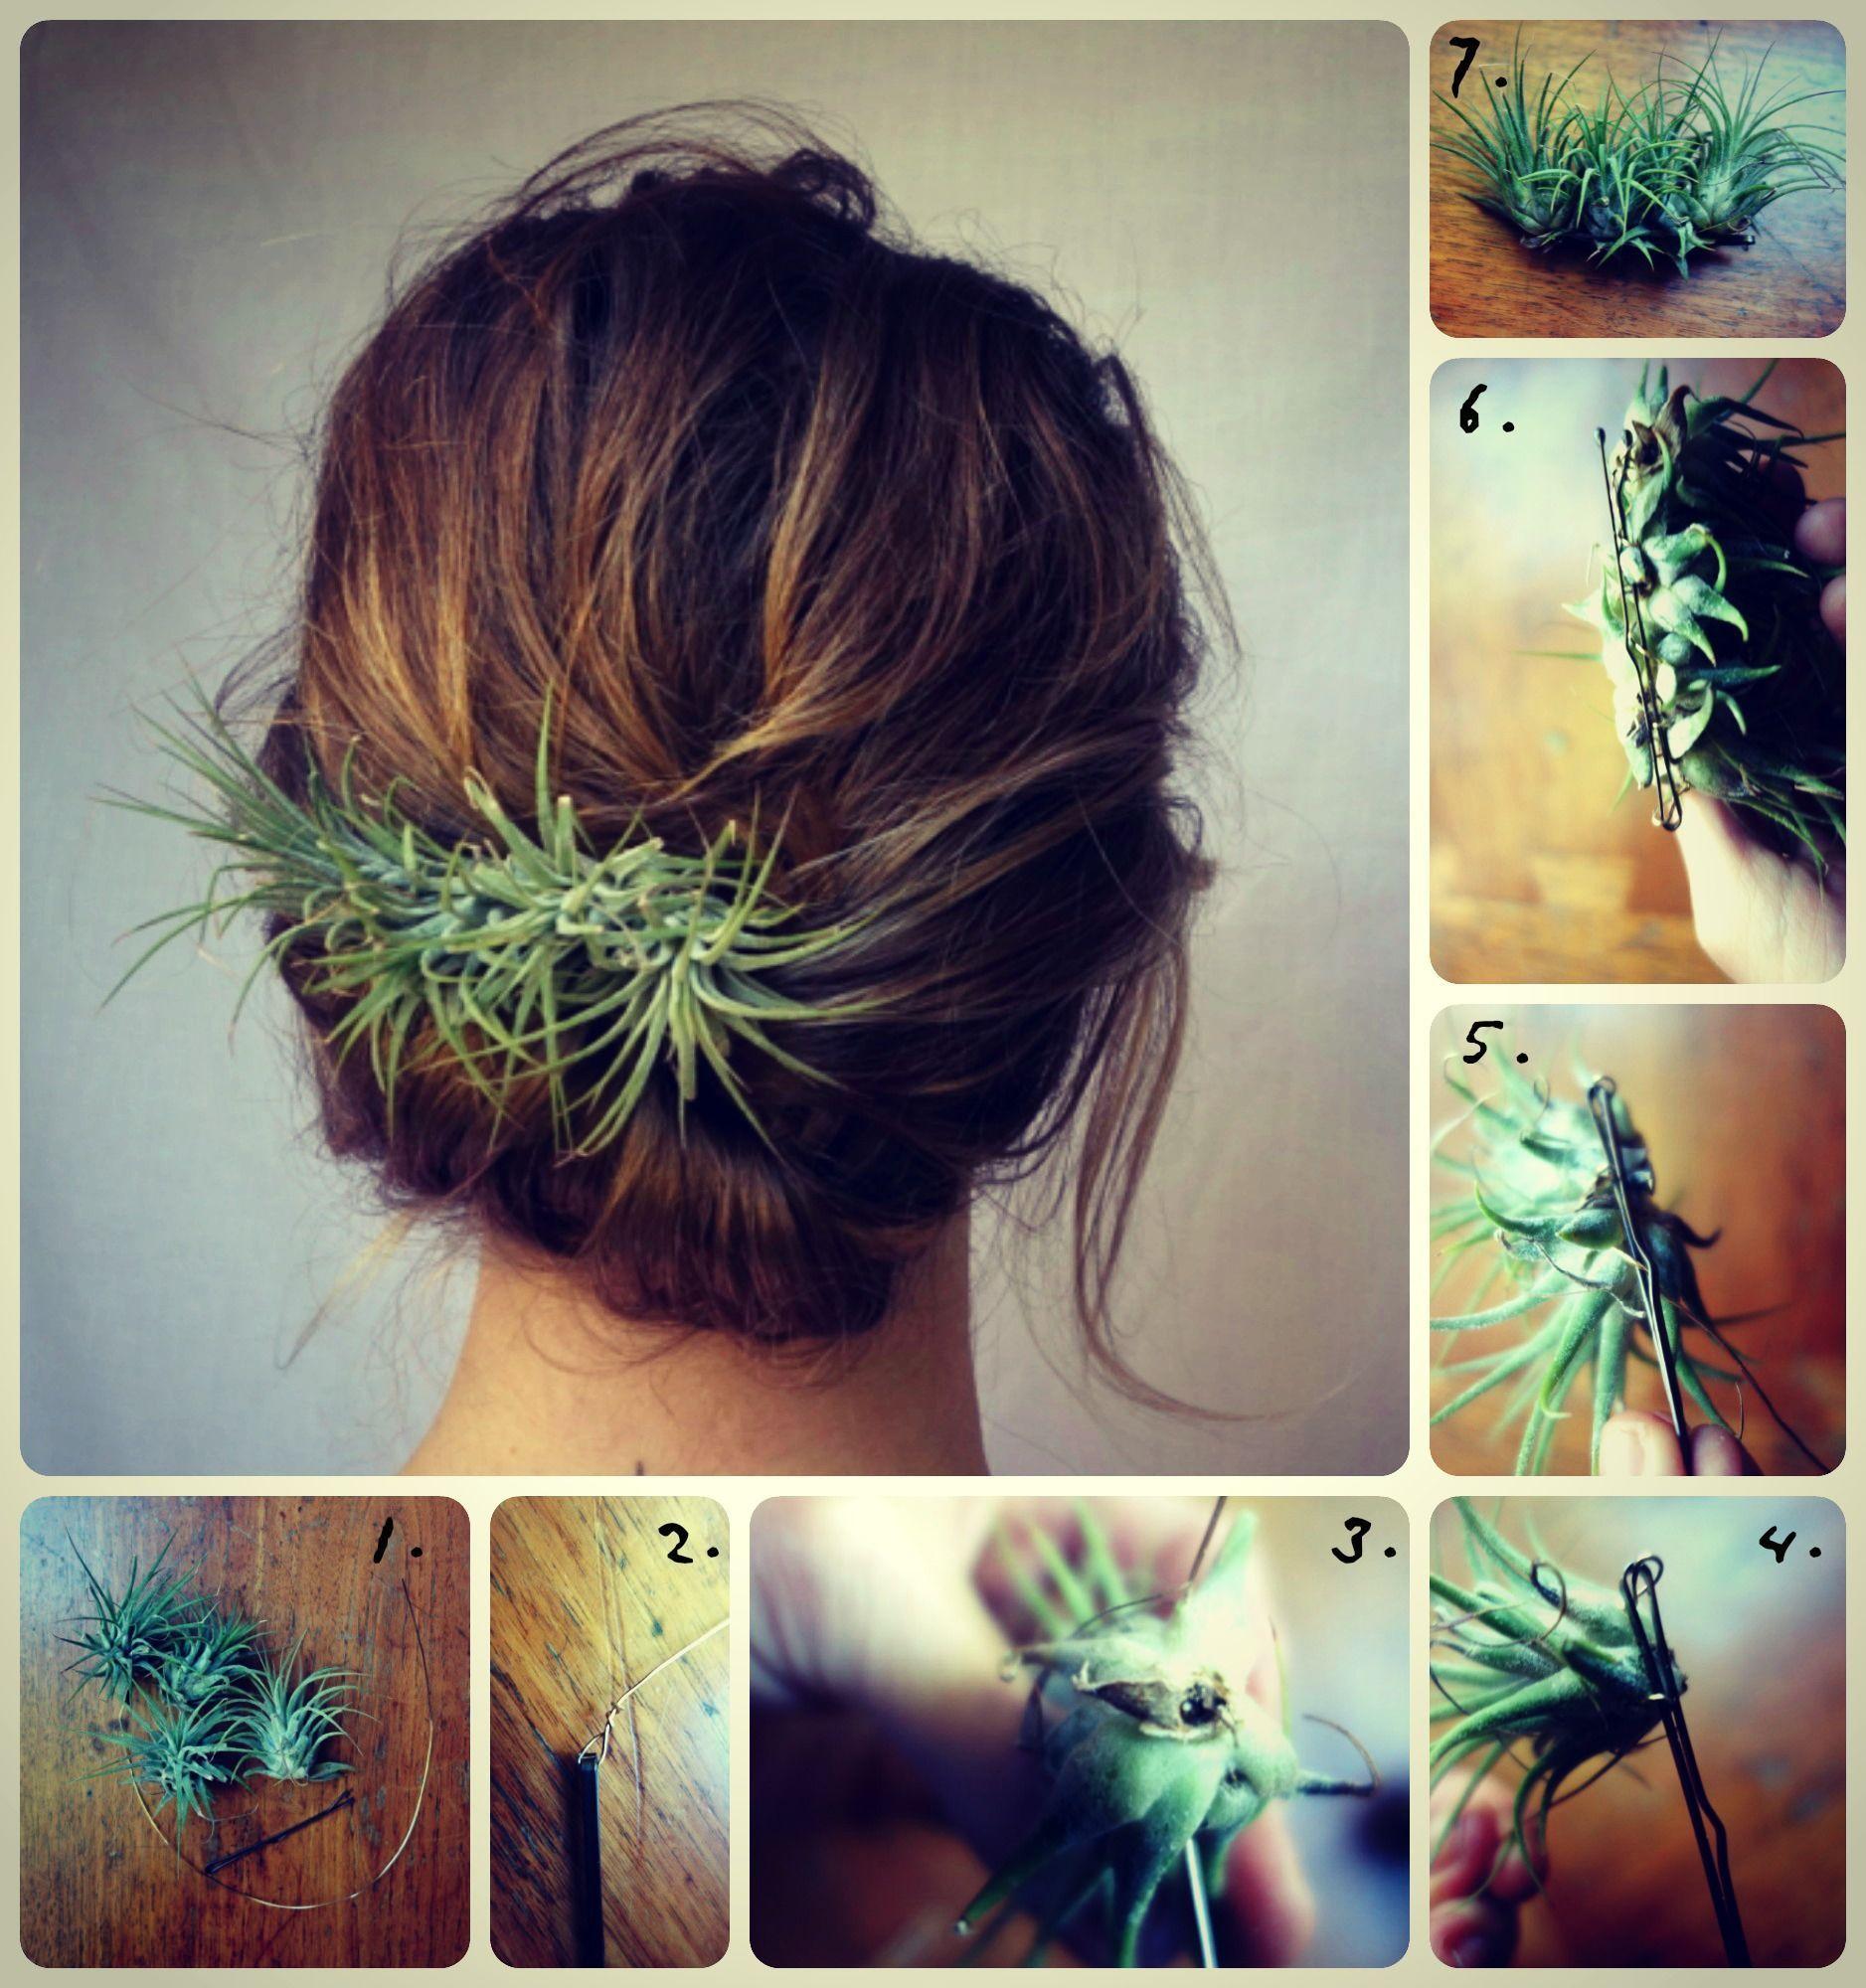 hairplant.jpg (1877×2000)